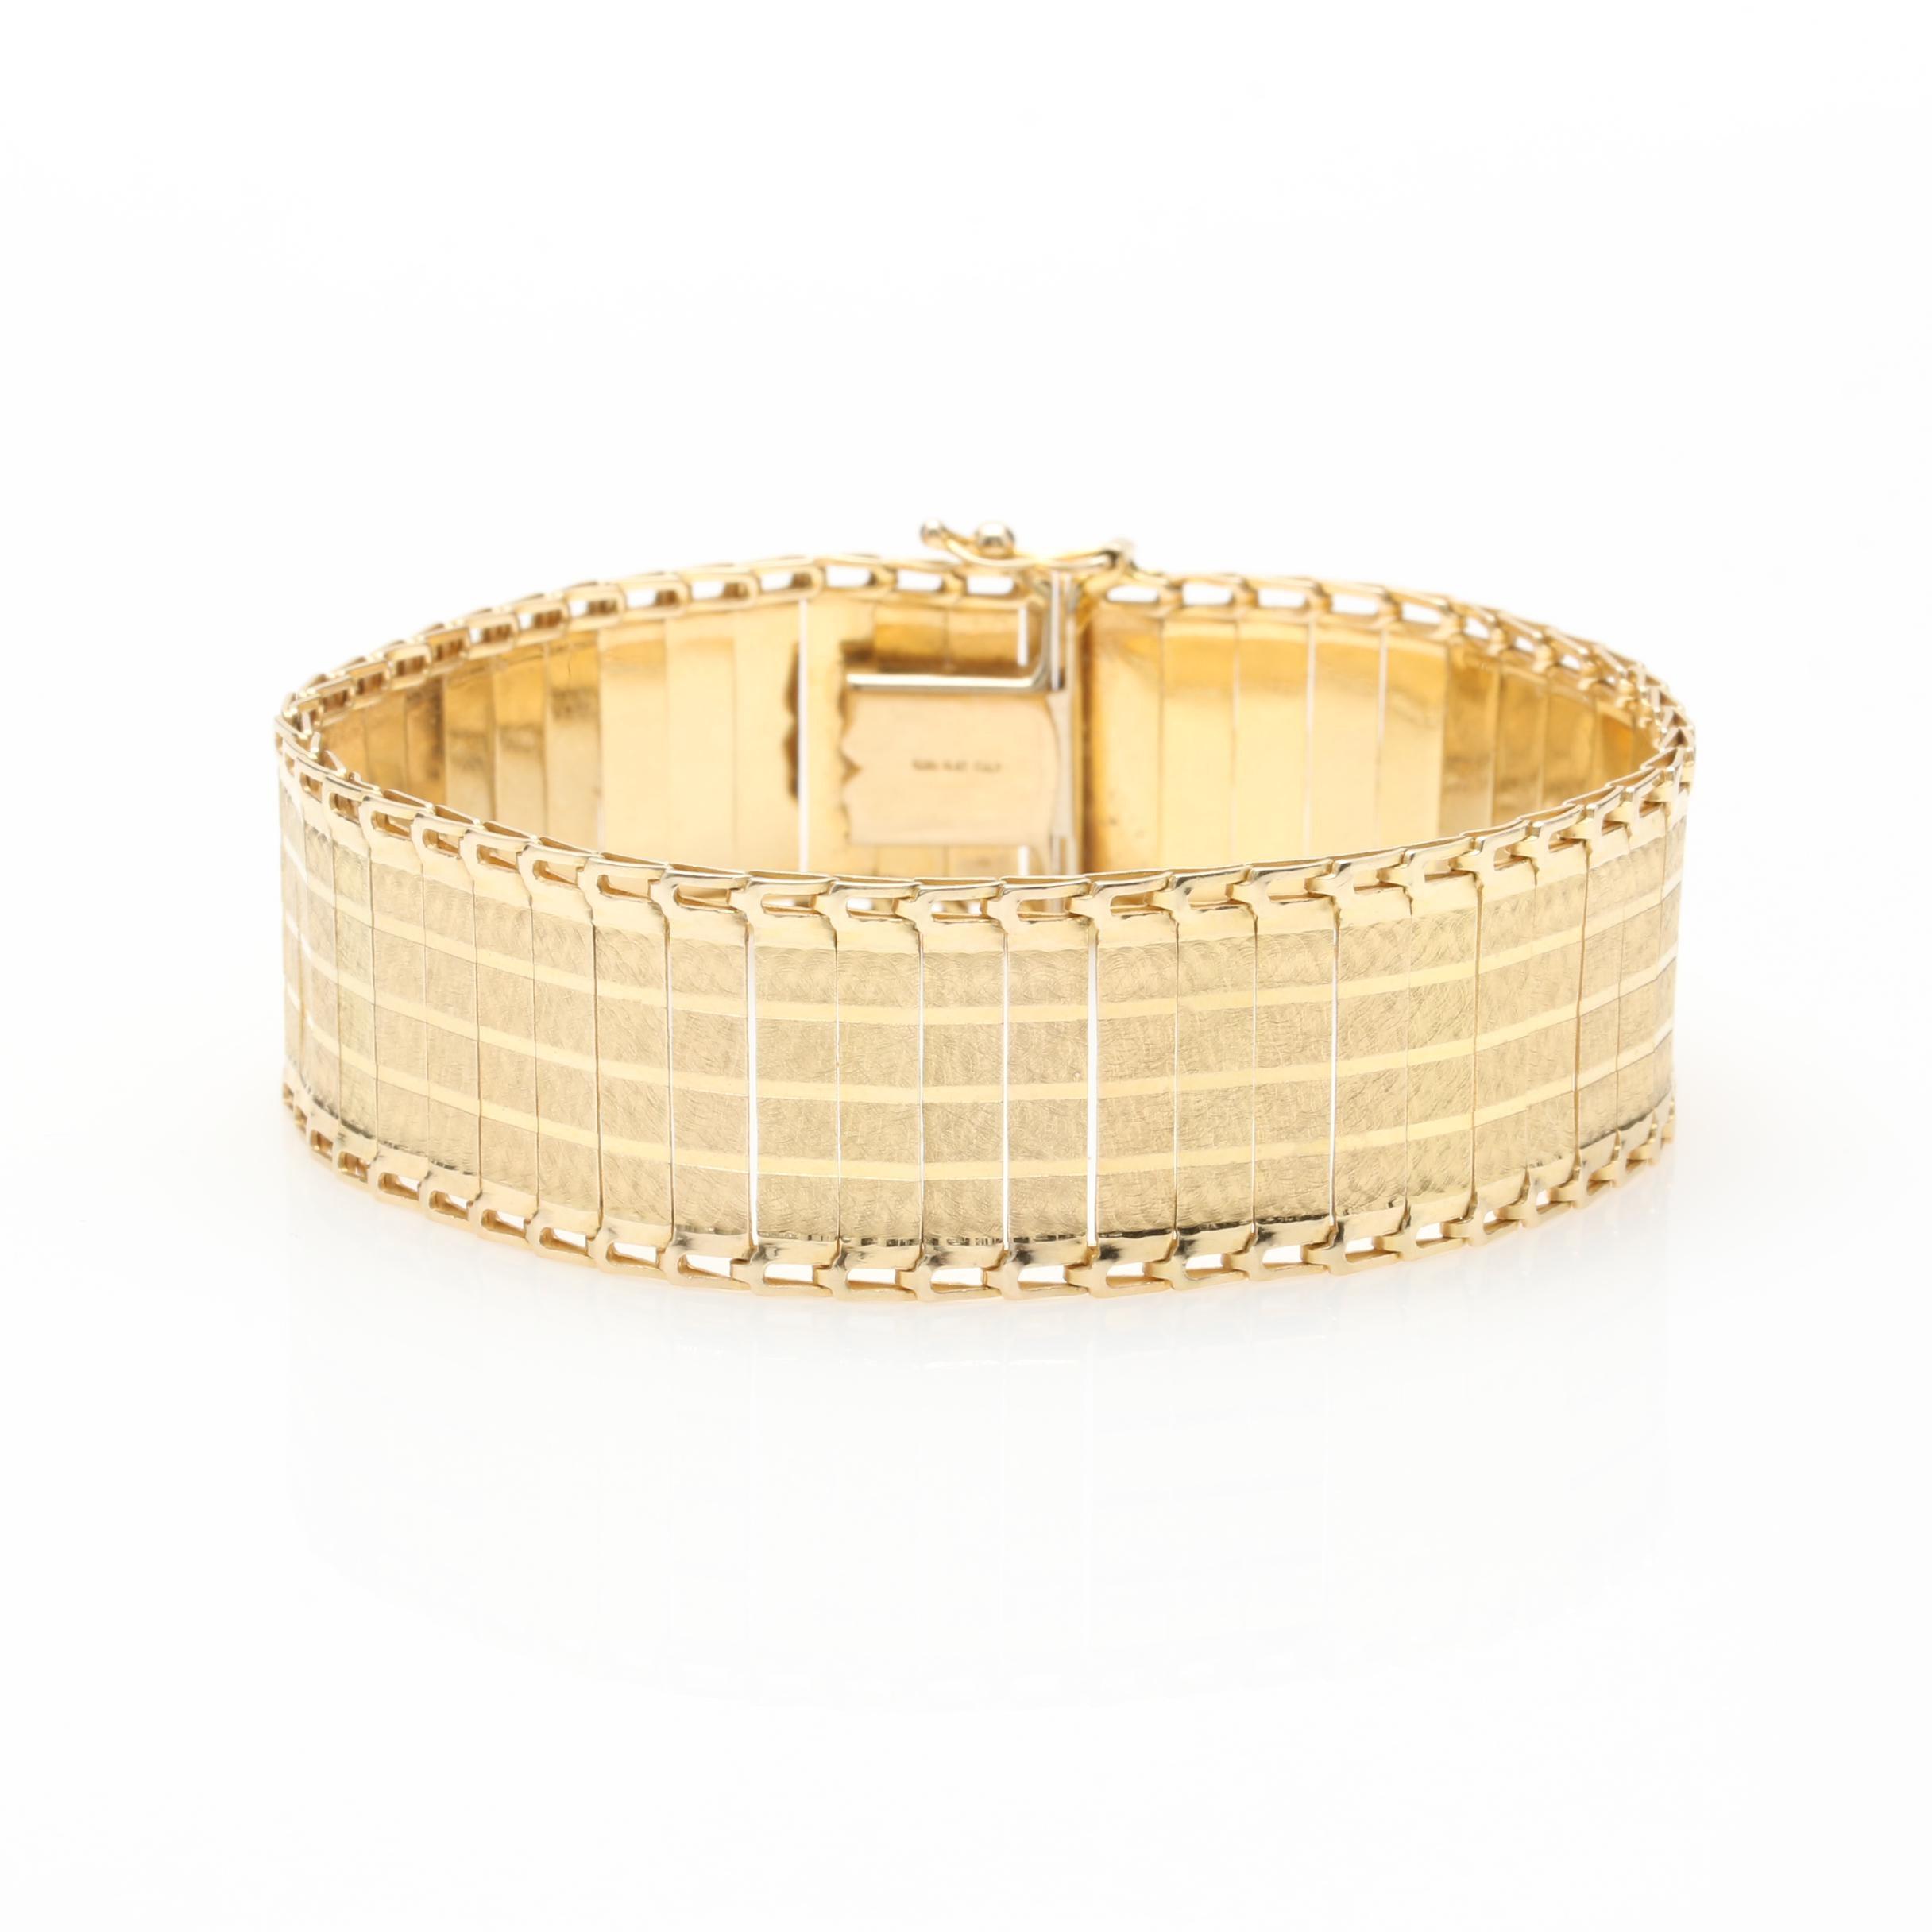 Italian 14K Yellow Gold Bracelet